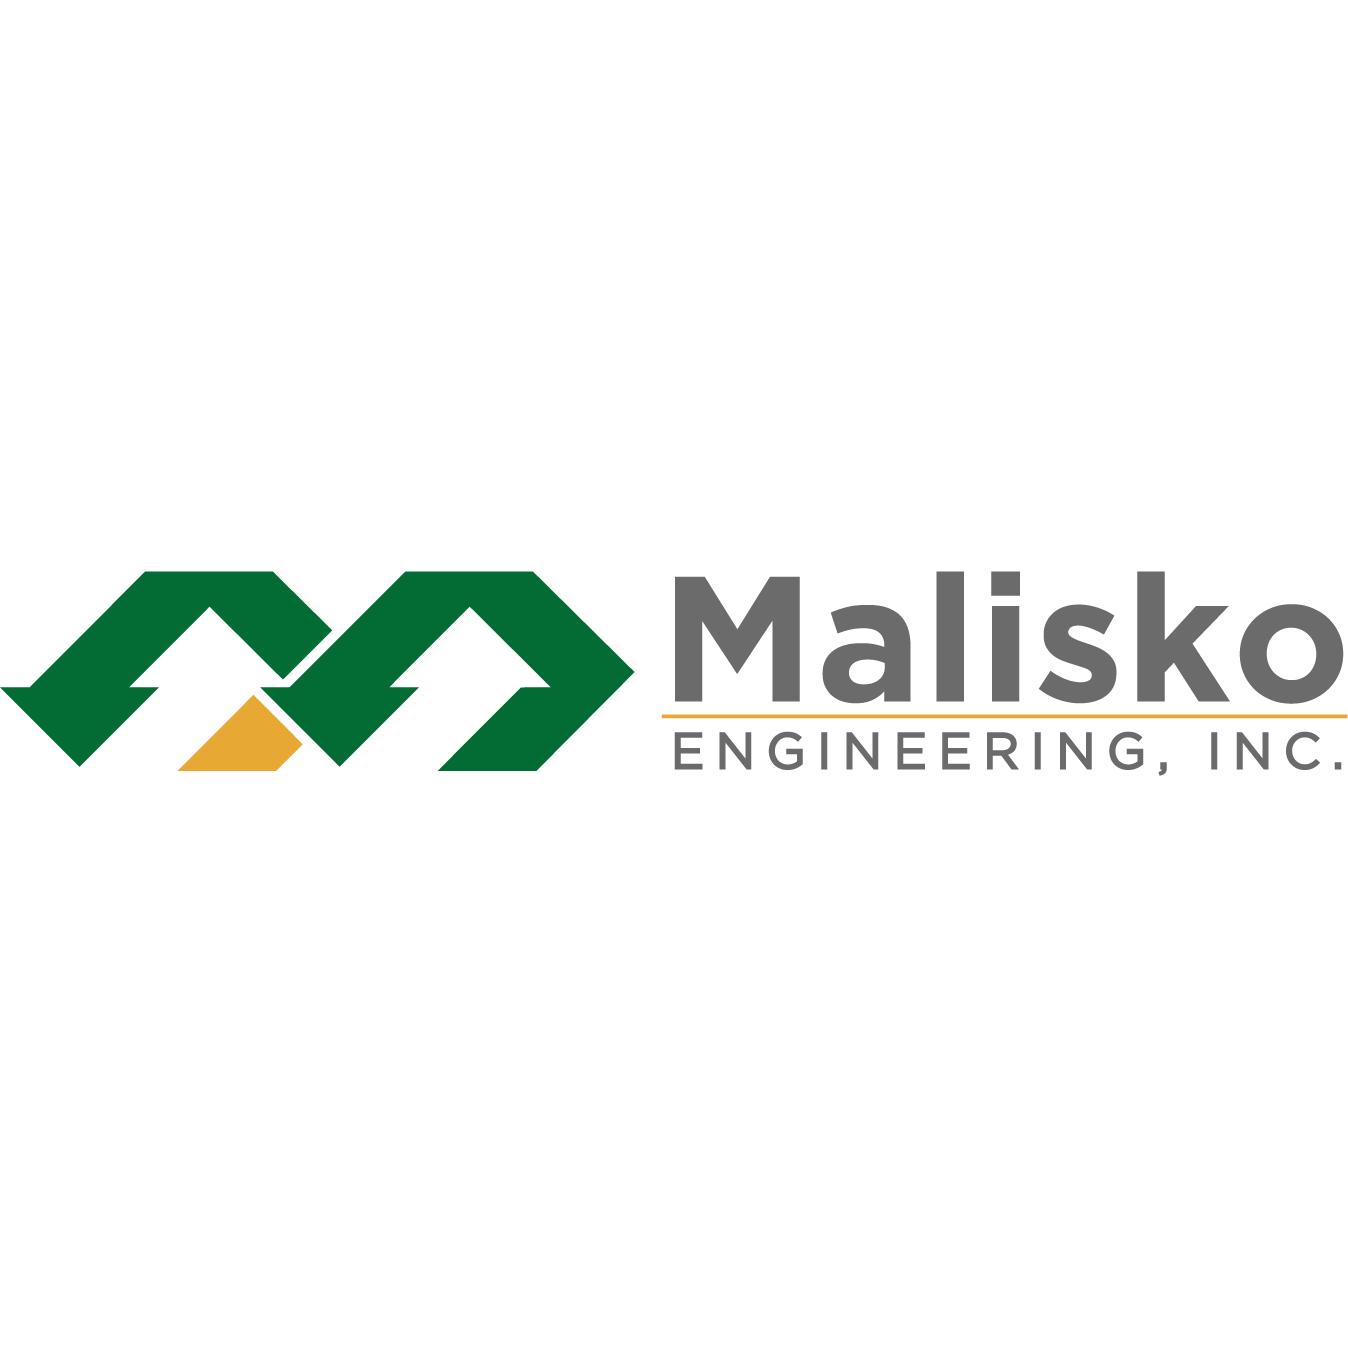 Malisko Engineering, Inc